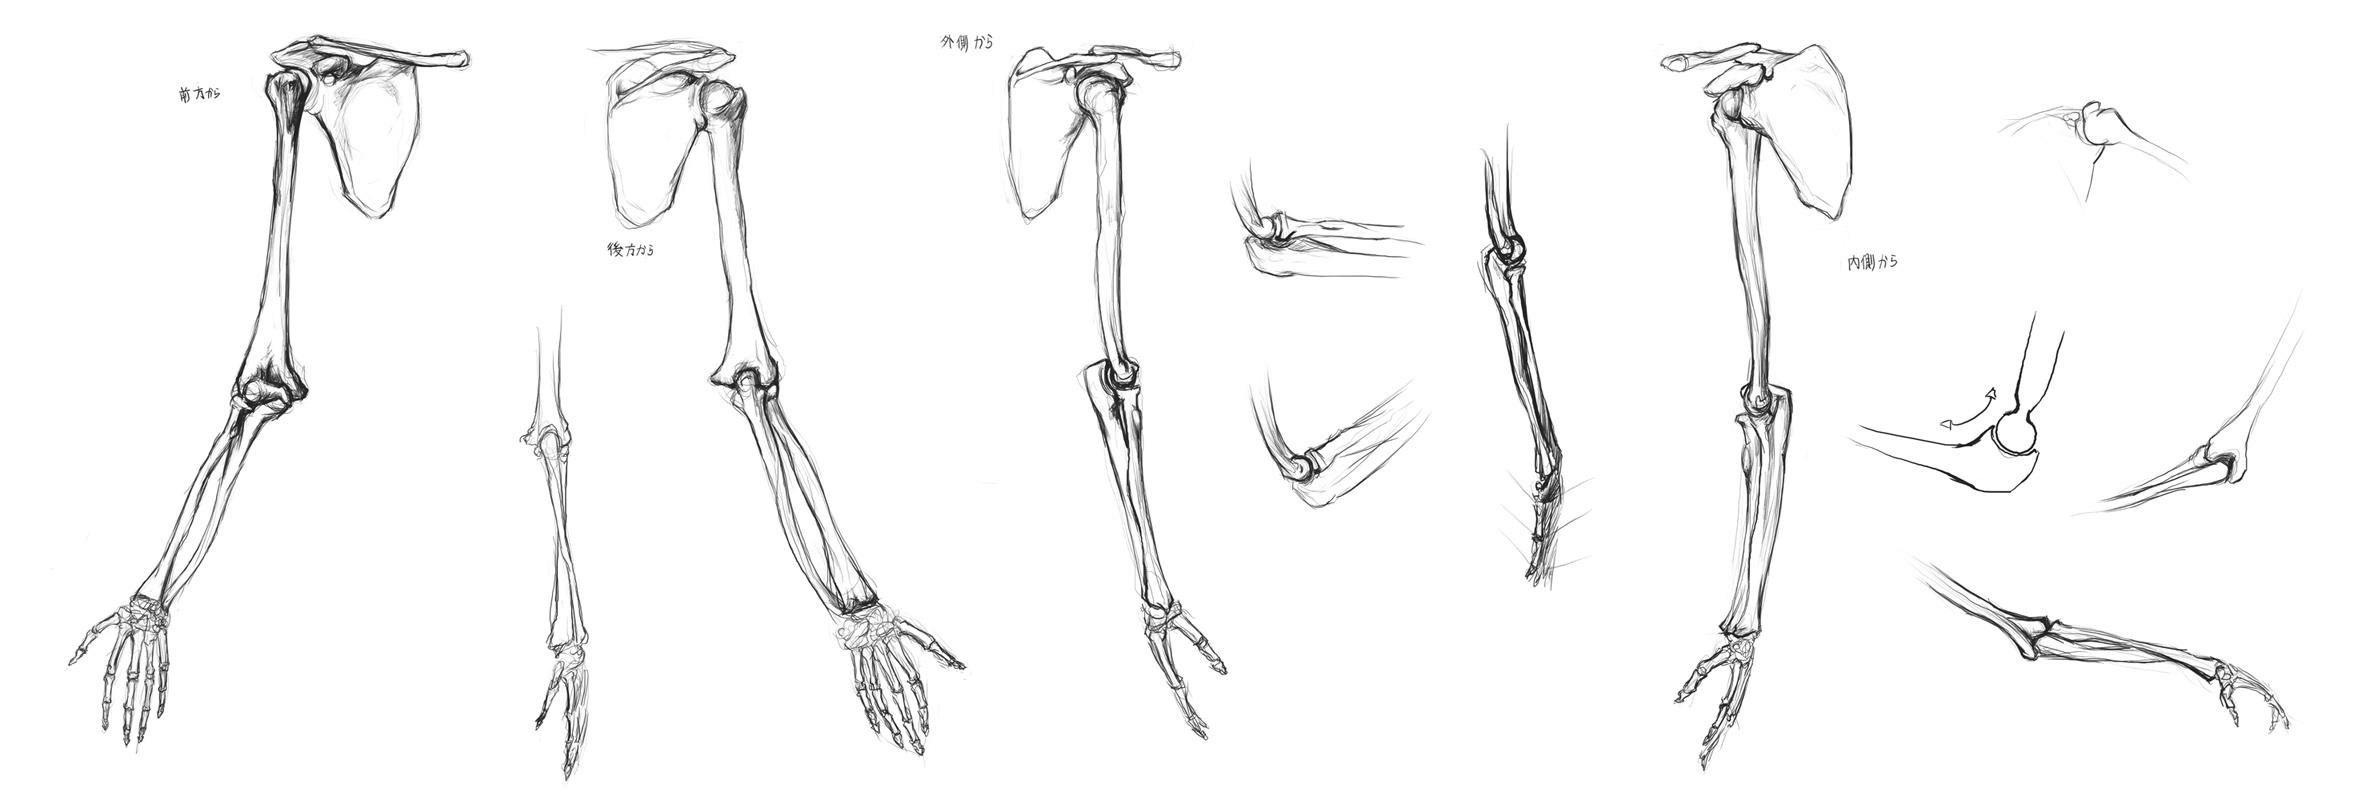 Anatomy Study - arm bones by Call0ps on DeviantArt